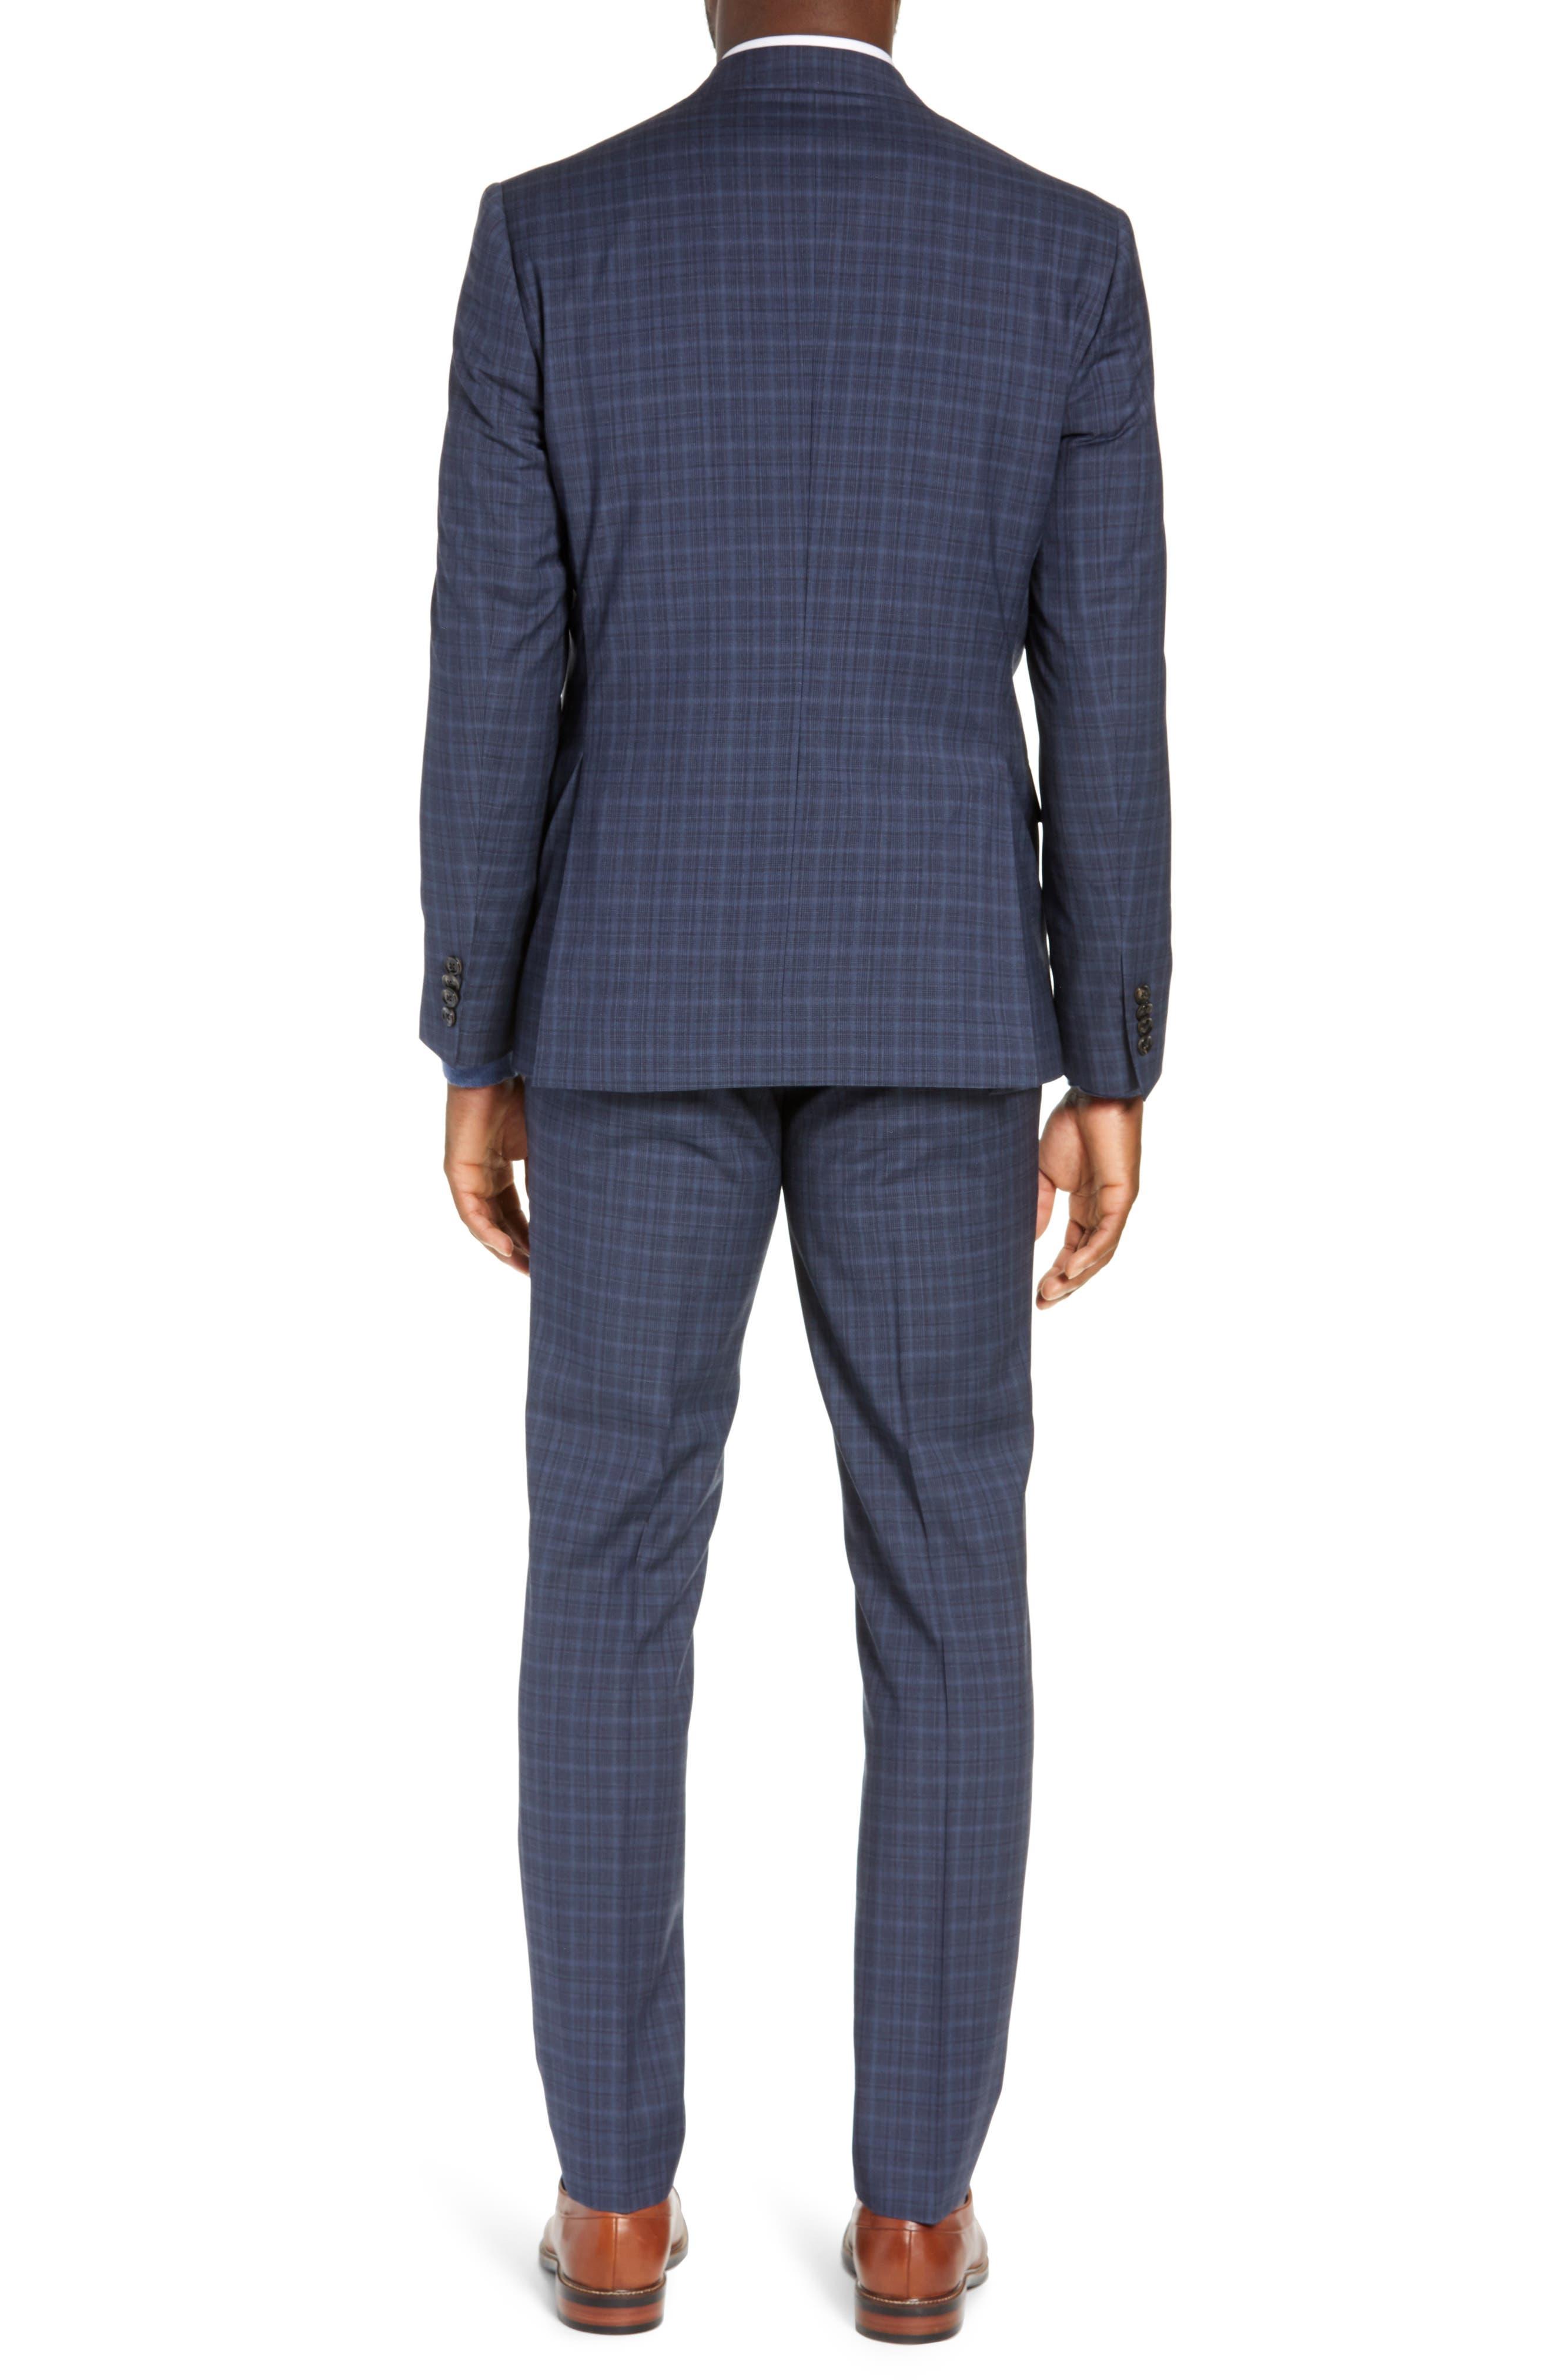 TED BAKER LONDON,                             Roger Slim Fit Plaid Wool Suit,                             Alternate thumbnail 2, color,                             GREY